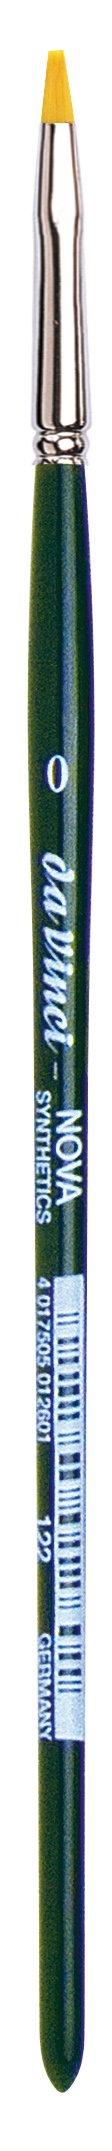 da Vinci Nova Series 122 Hobby Paint Brush, Hobby Flat Synthetic, Size 0 (122-0)